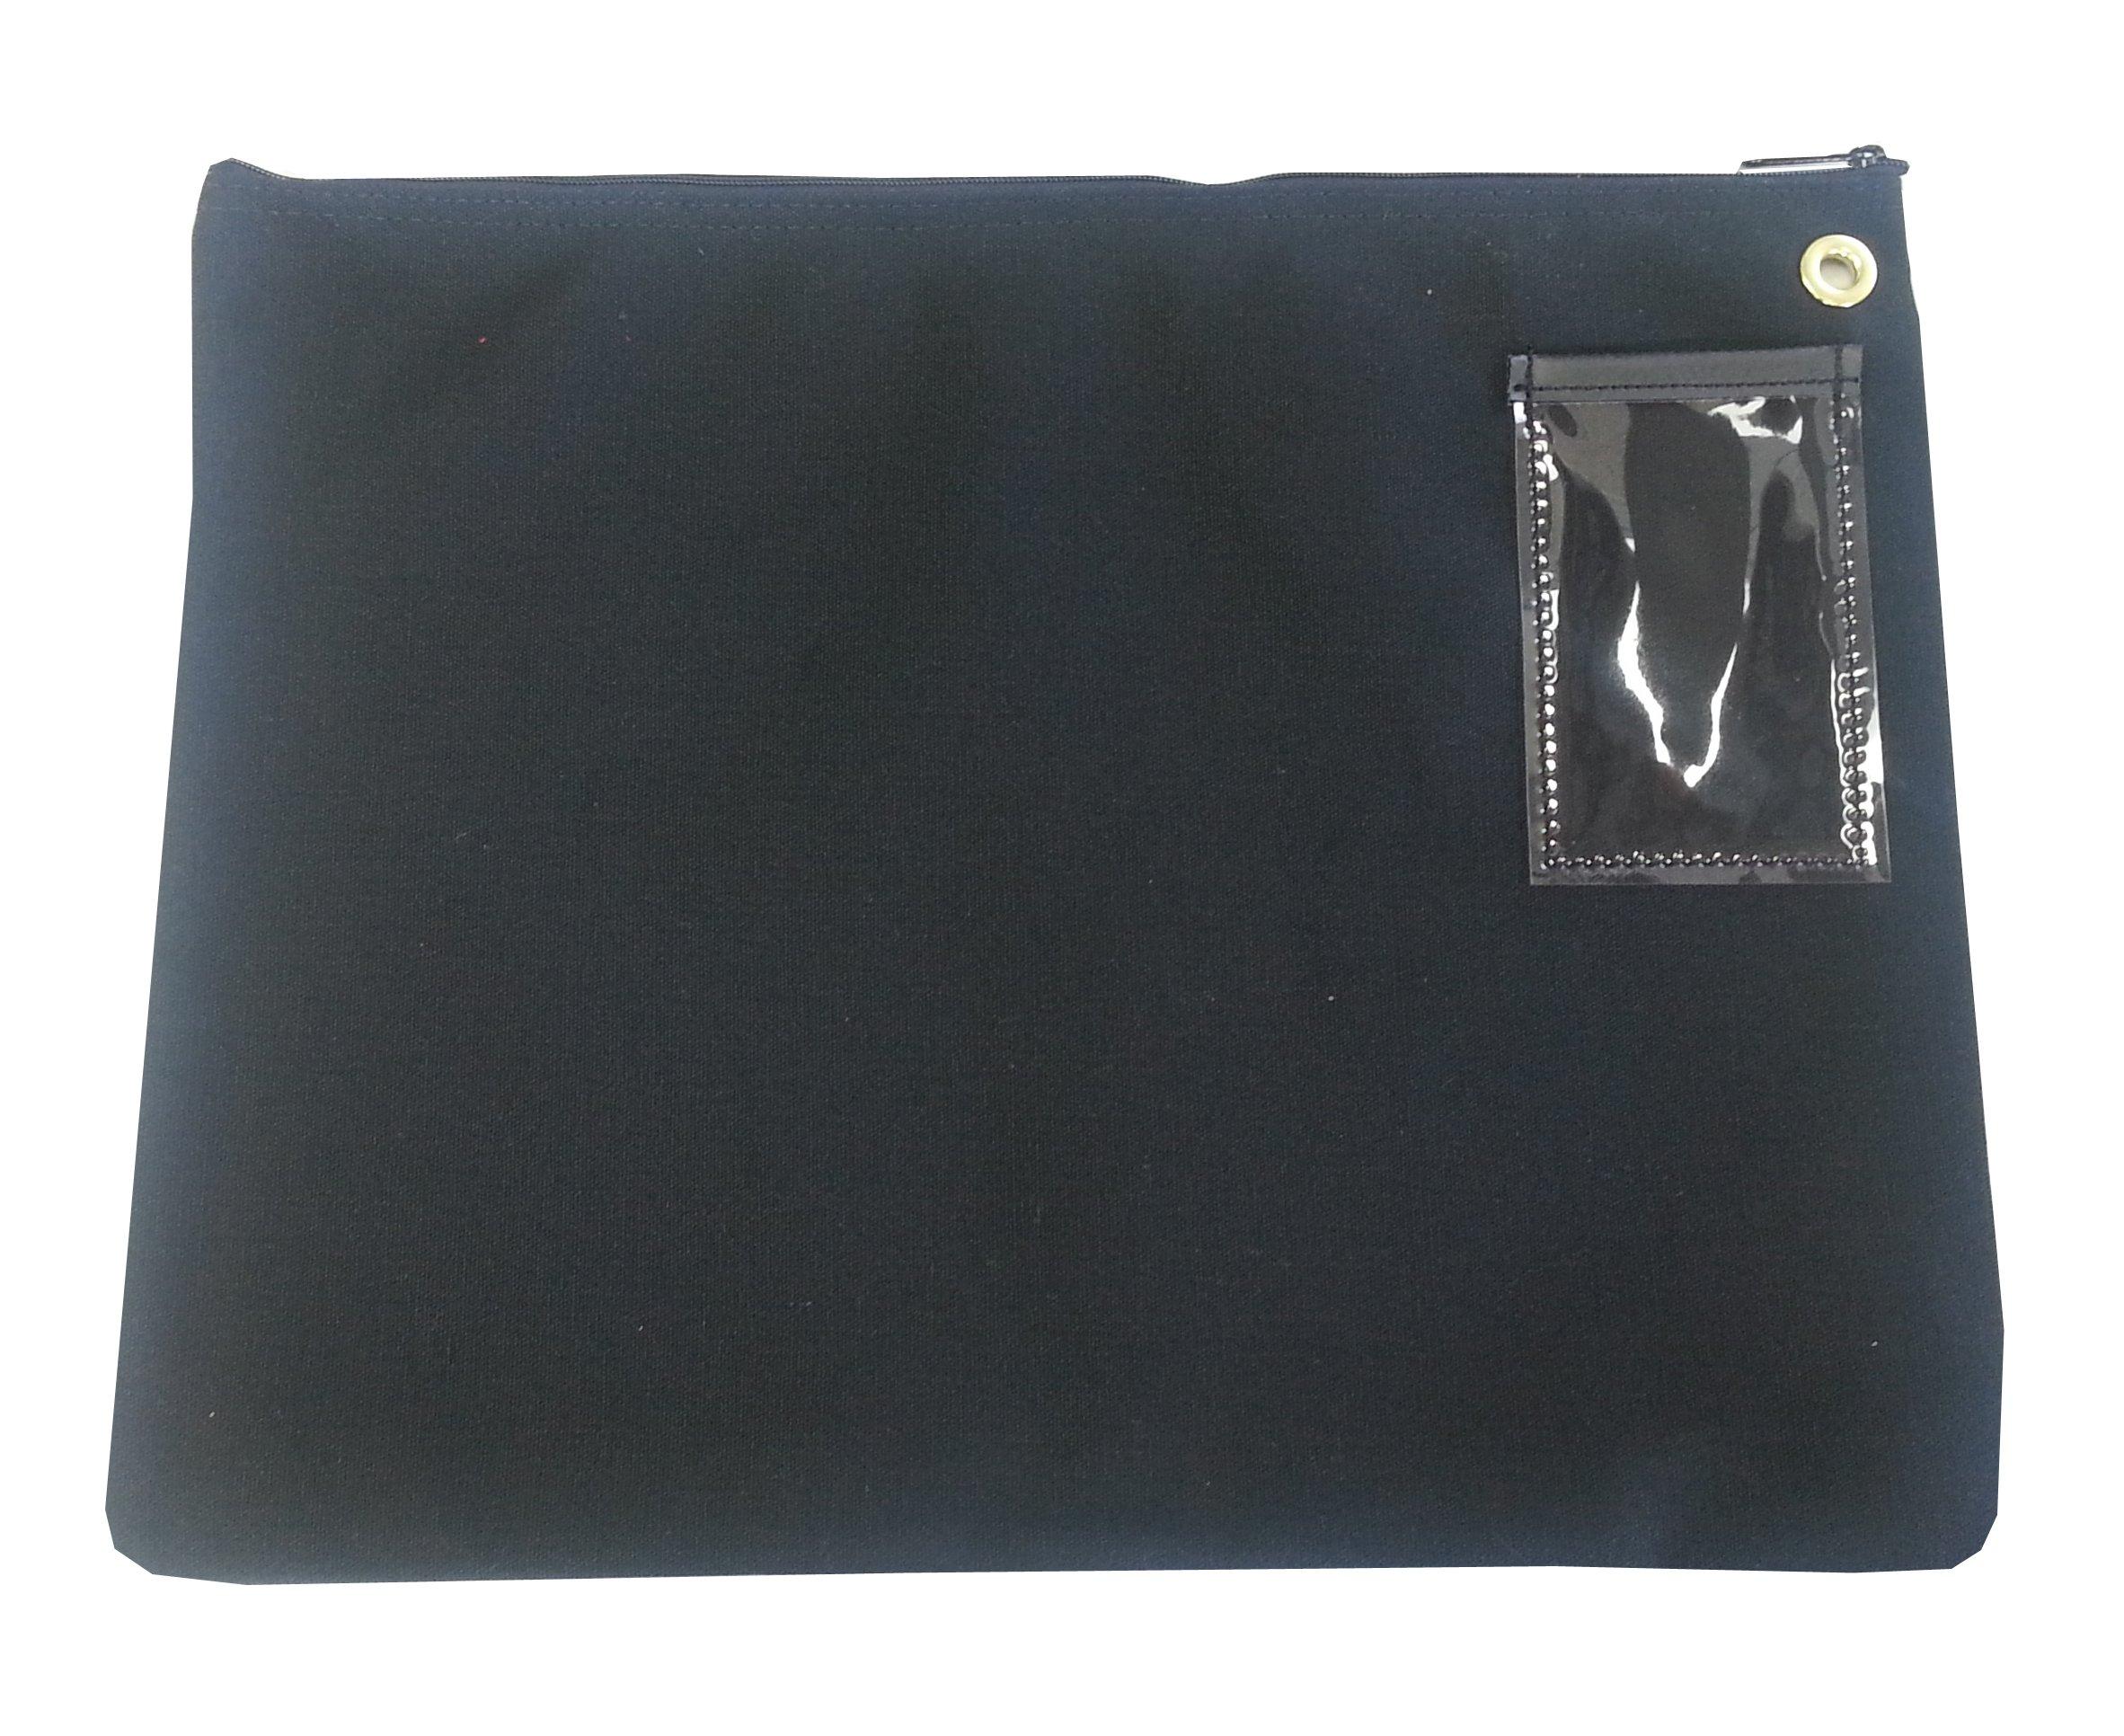 Interoffice Mailer Canvas Transit Sack Zipper Bag 18w x 14h Black by Cardinal Bag Supplies (Image #2)